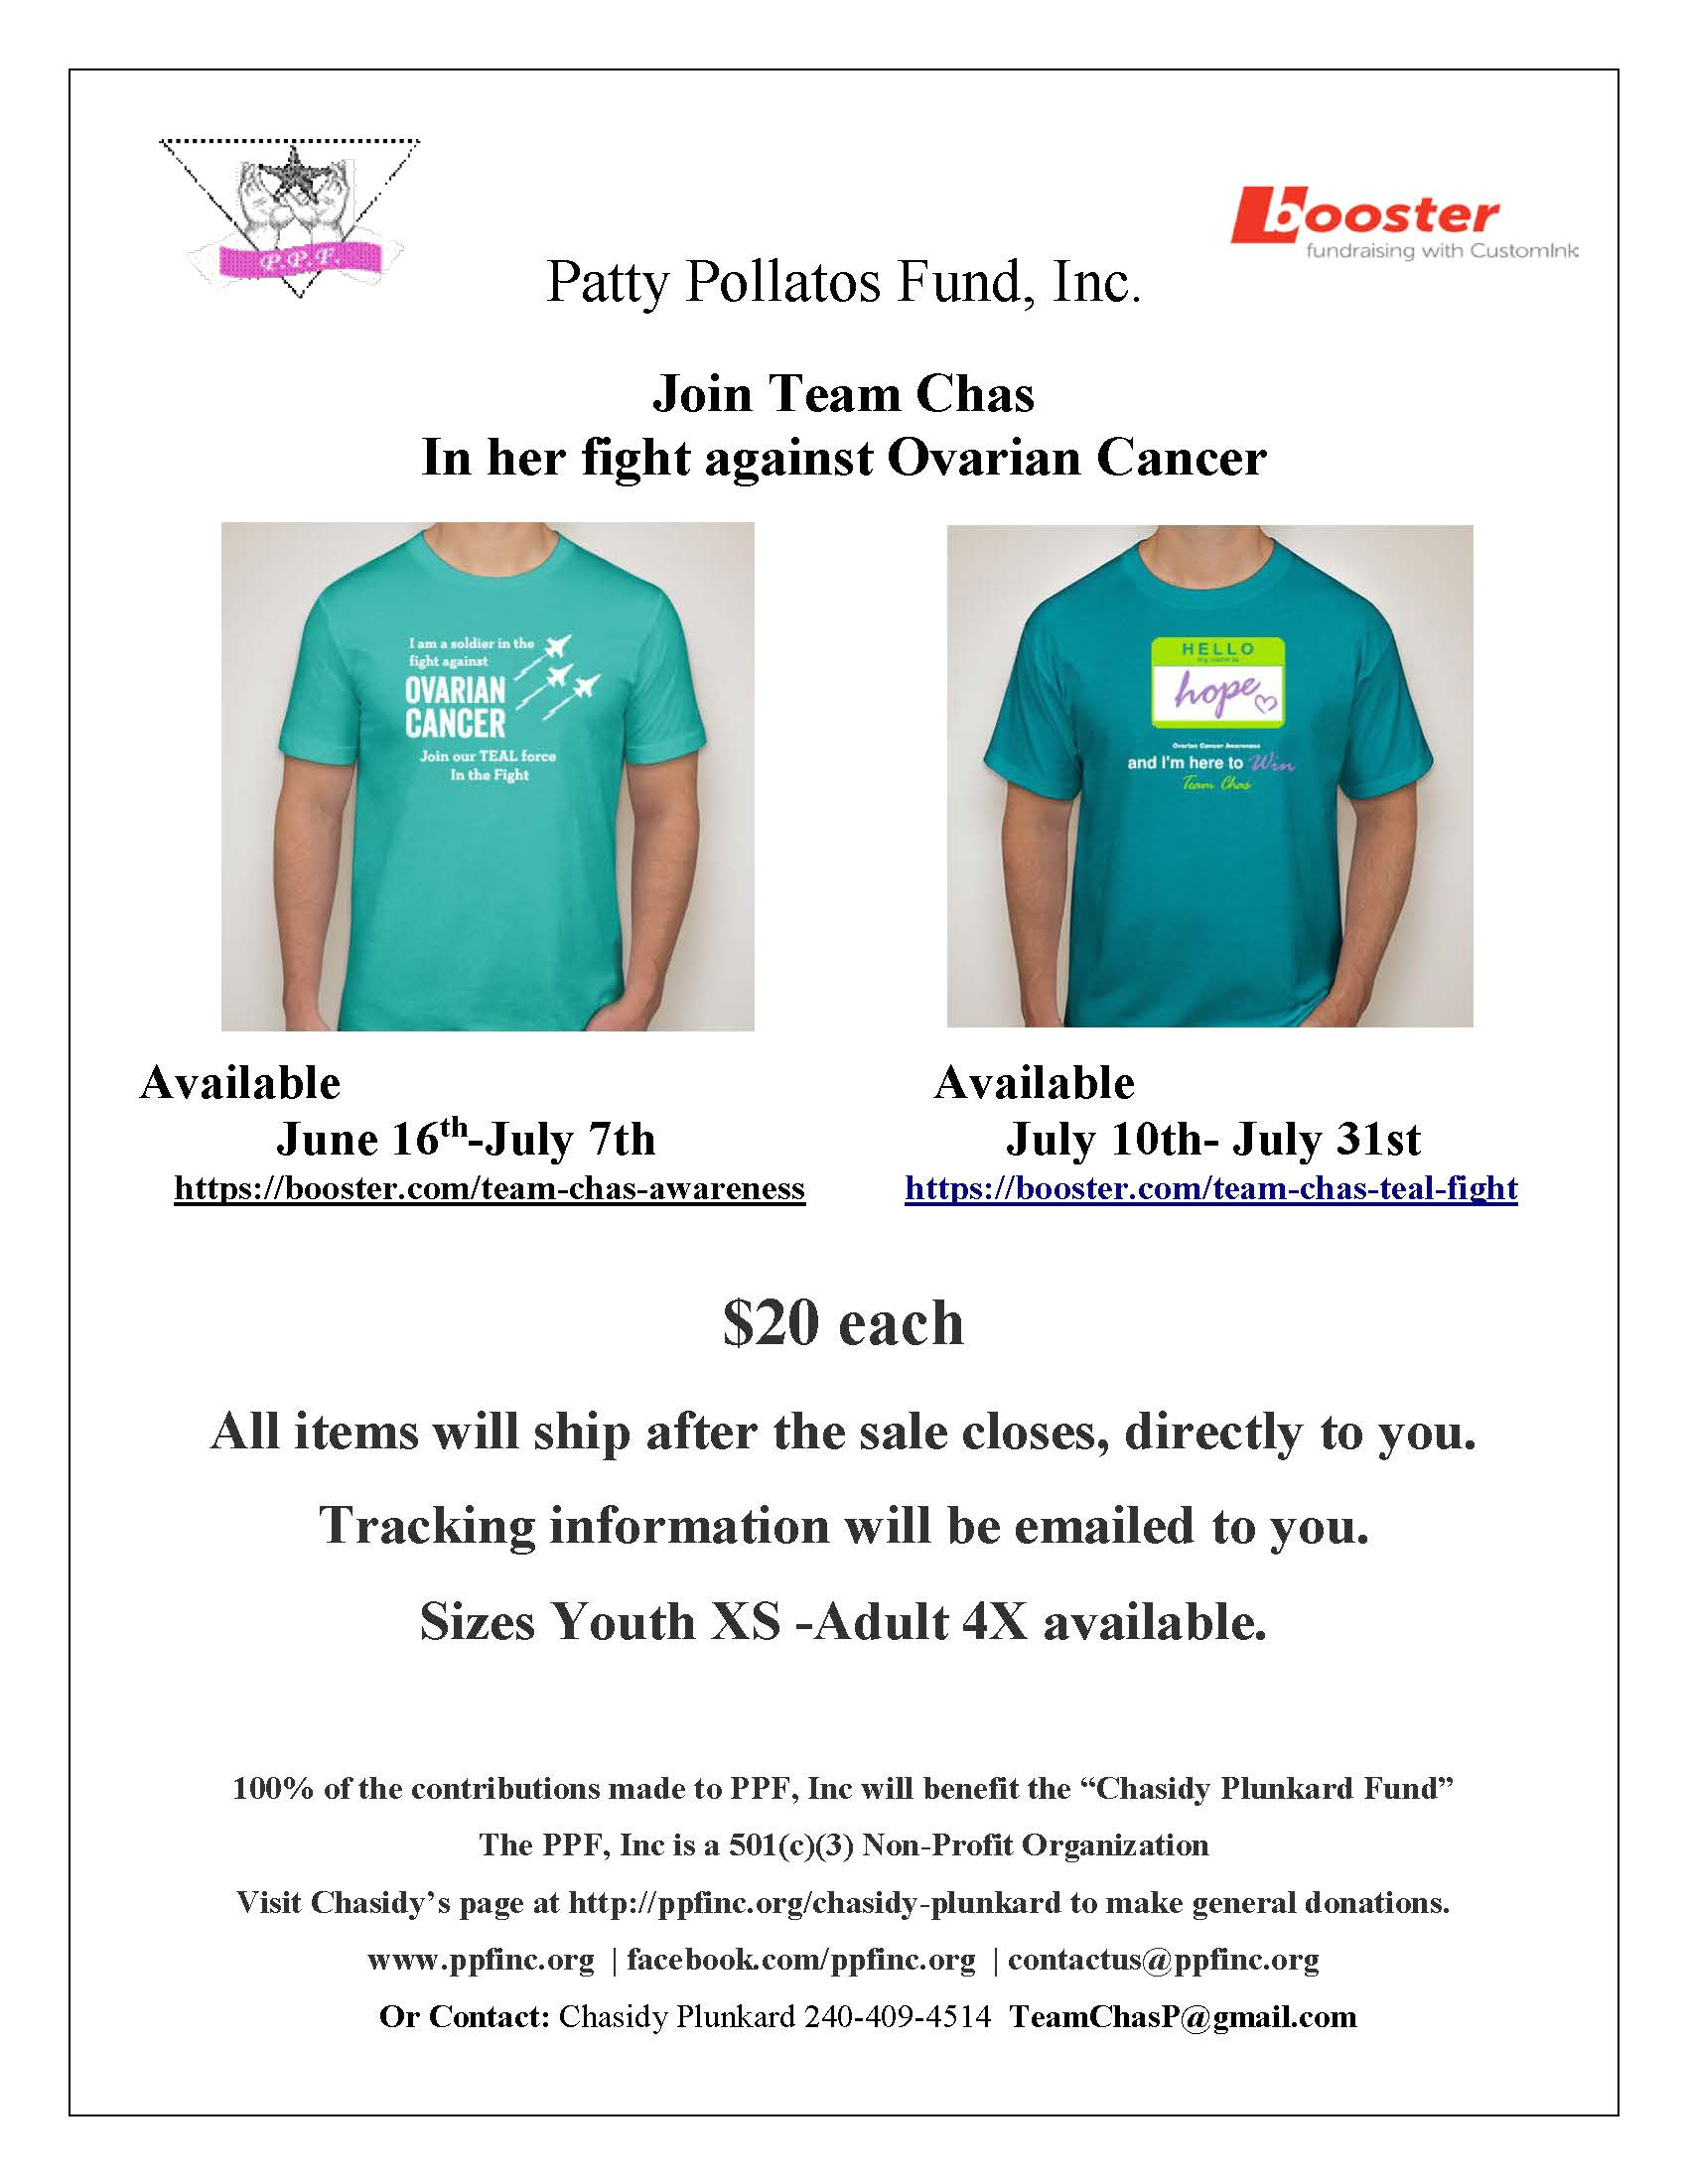 chasidy plunkard t shirt fundraiser